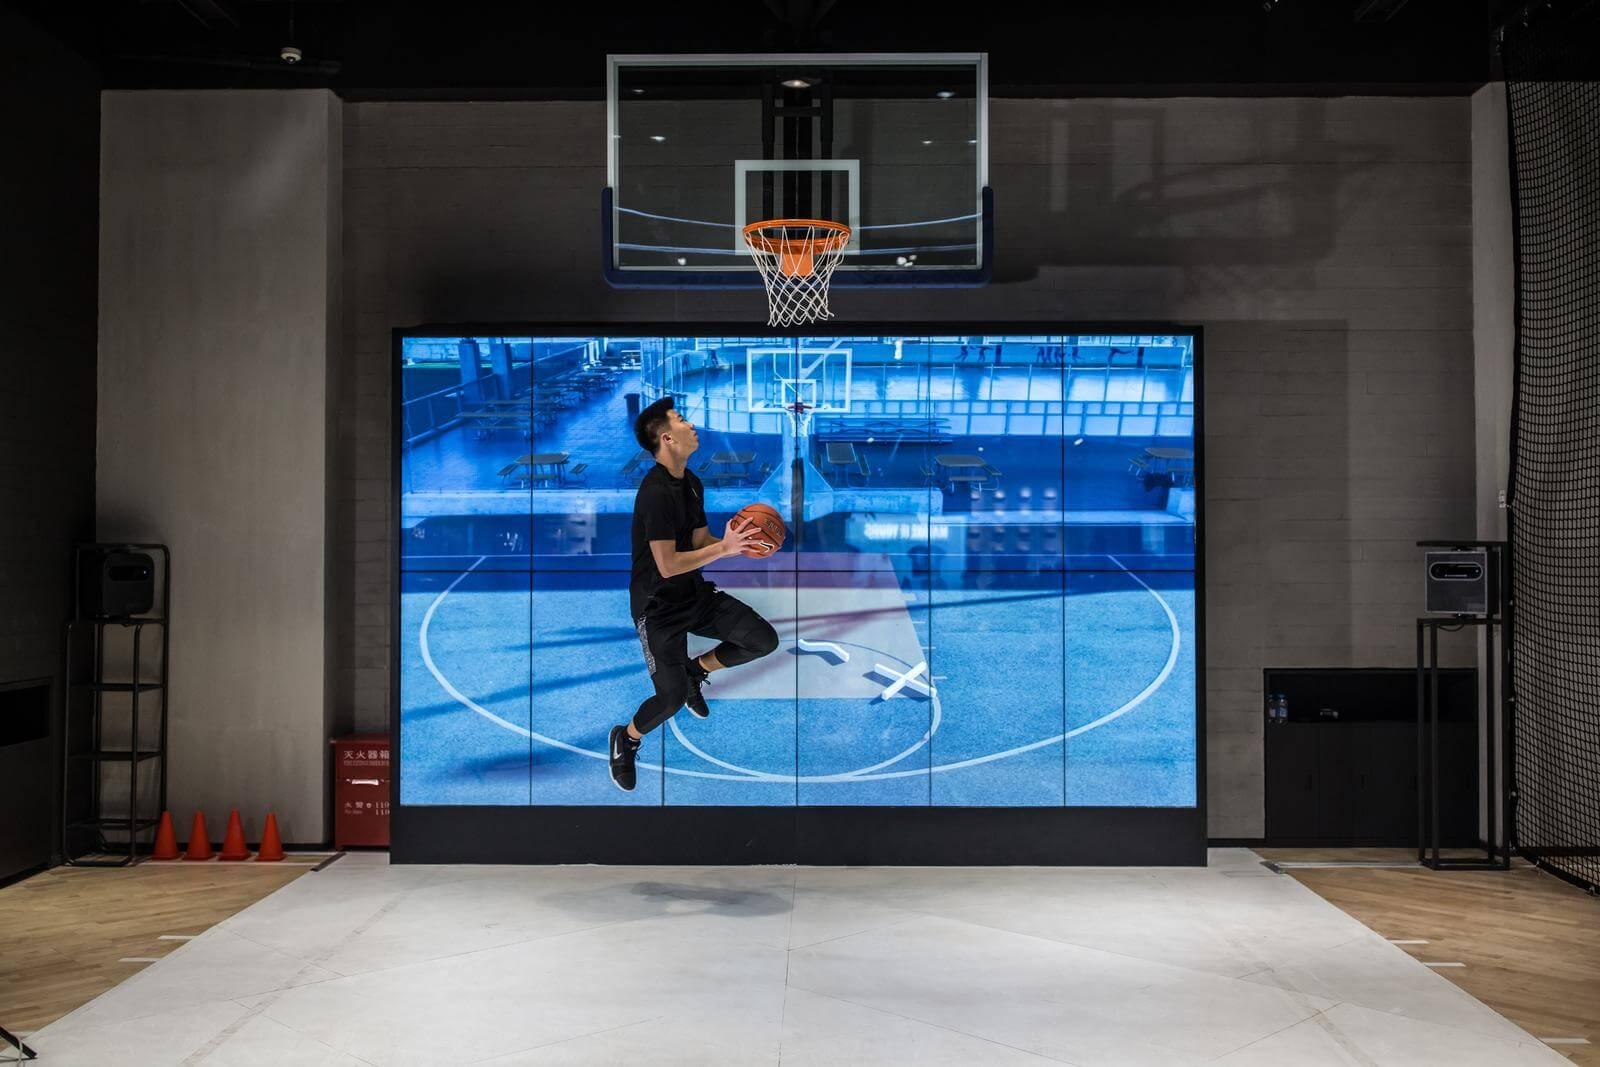 First Look: Inside the Nike & Jordan Basketball Experience